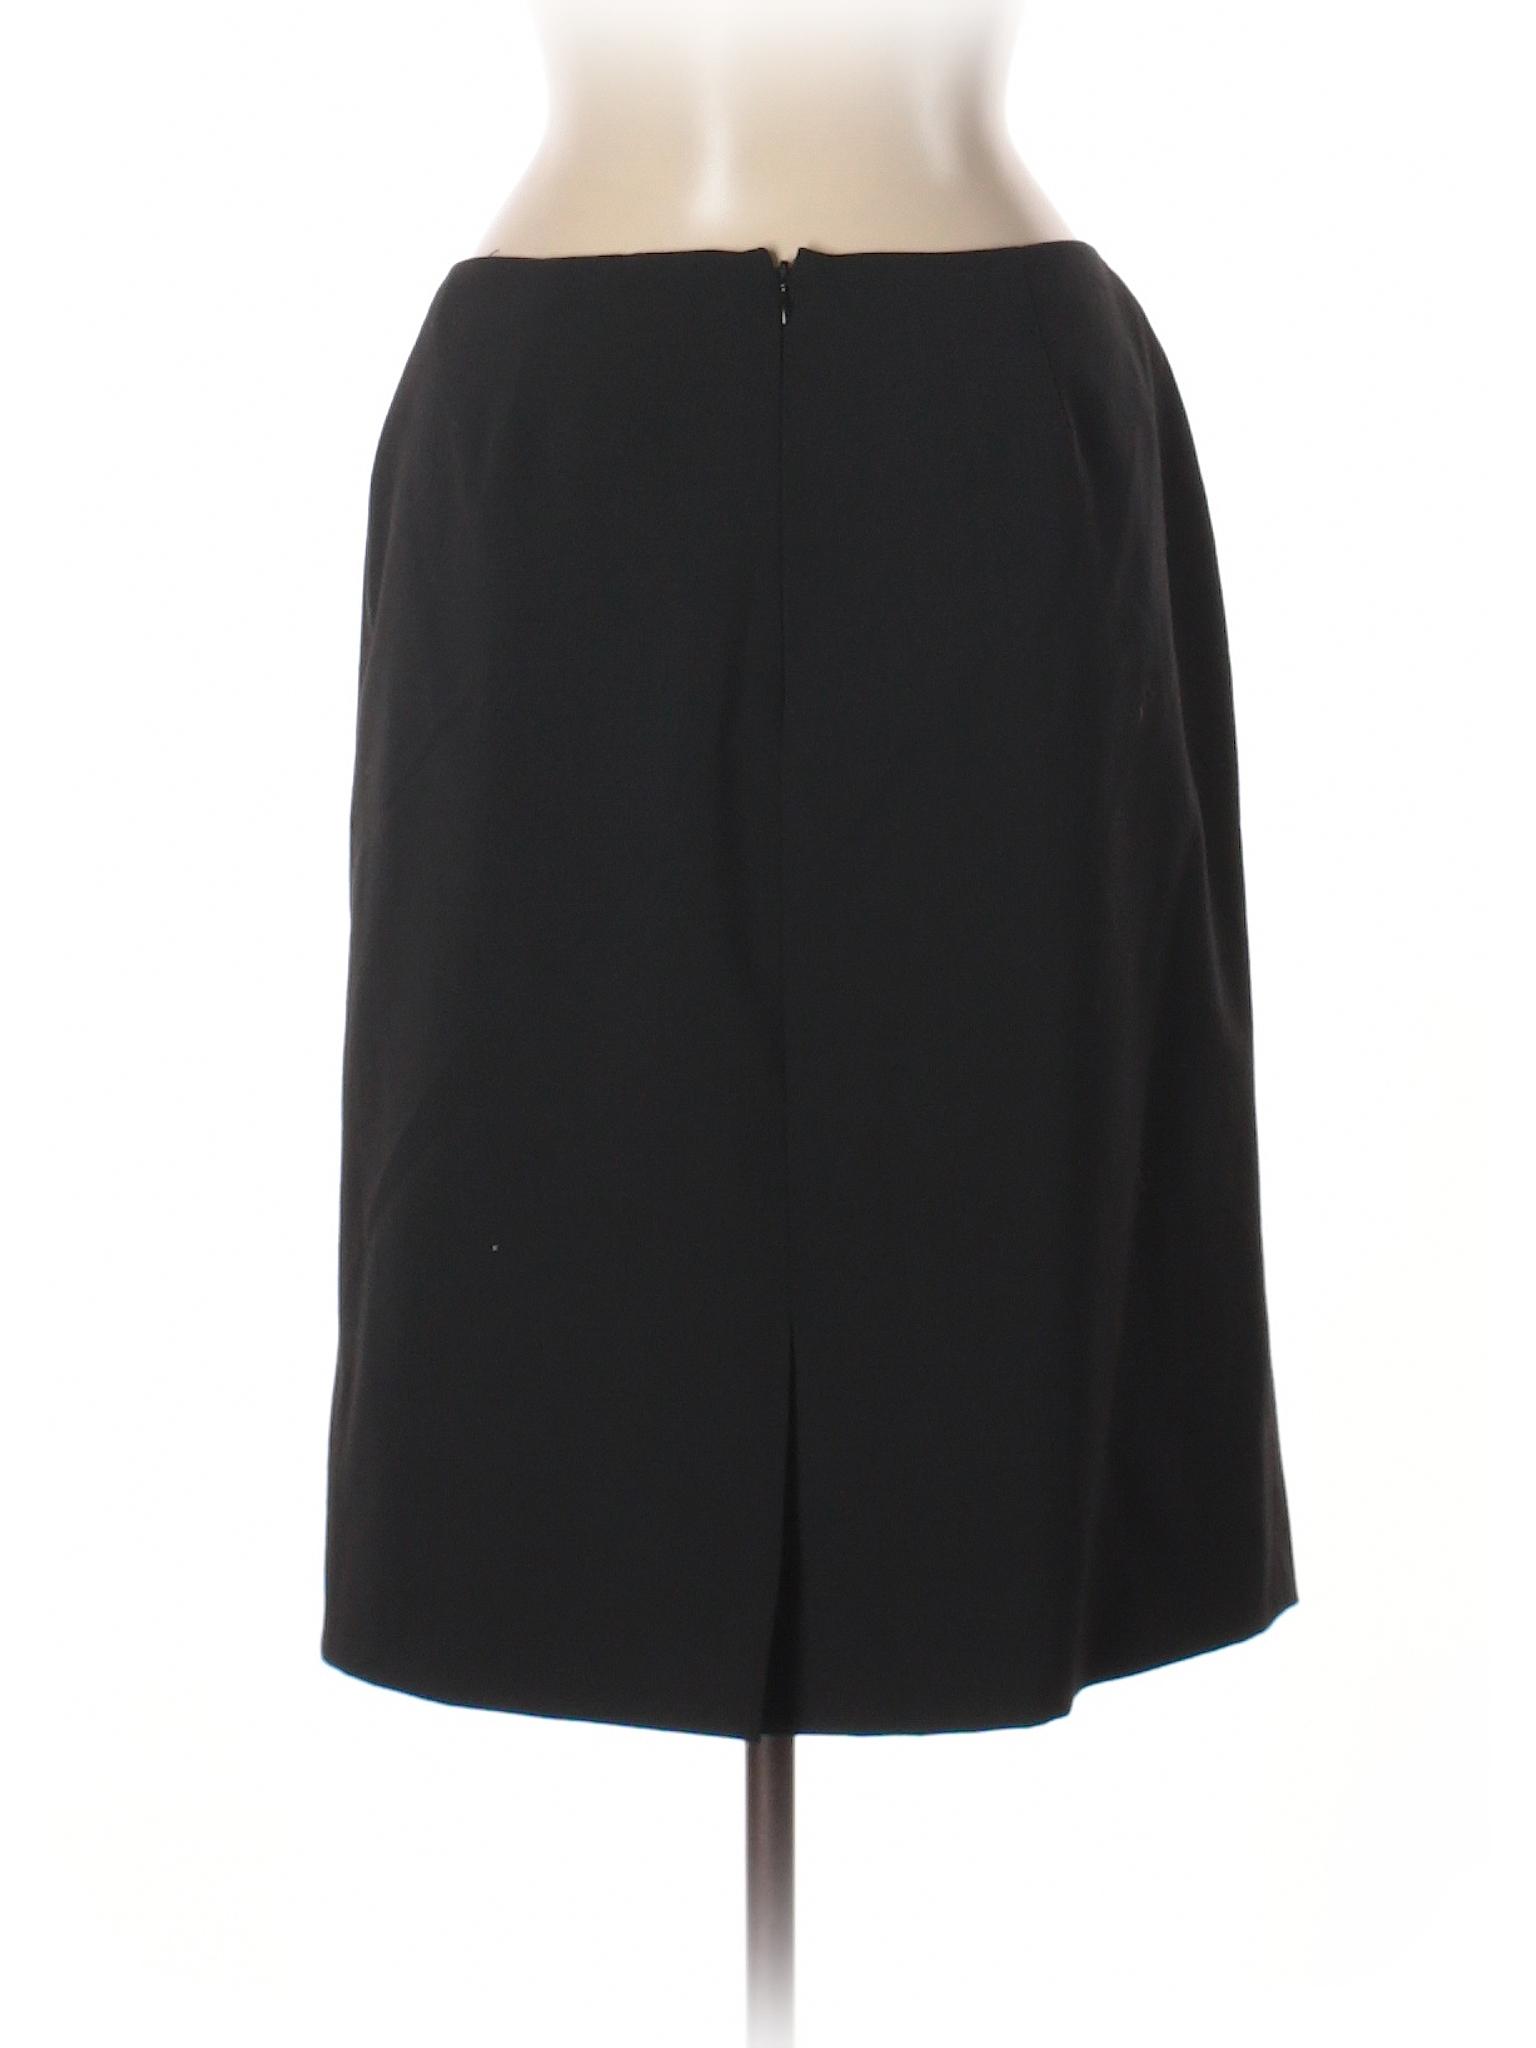 Boutique Casual Skirt Skirt Boutique Casual Casual Boutique UqHw57PH